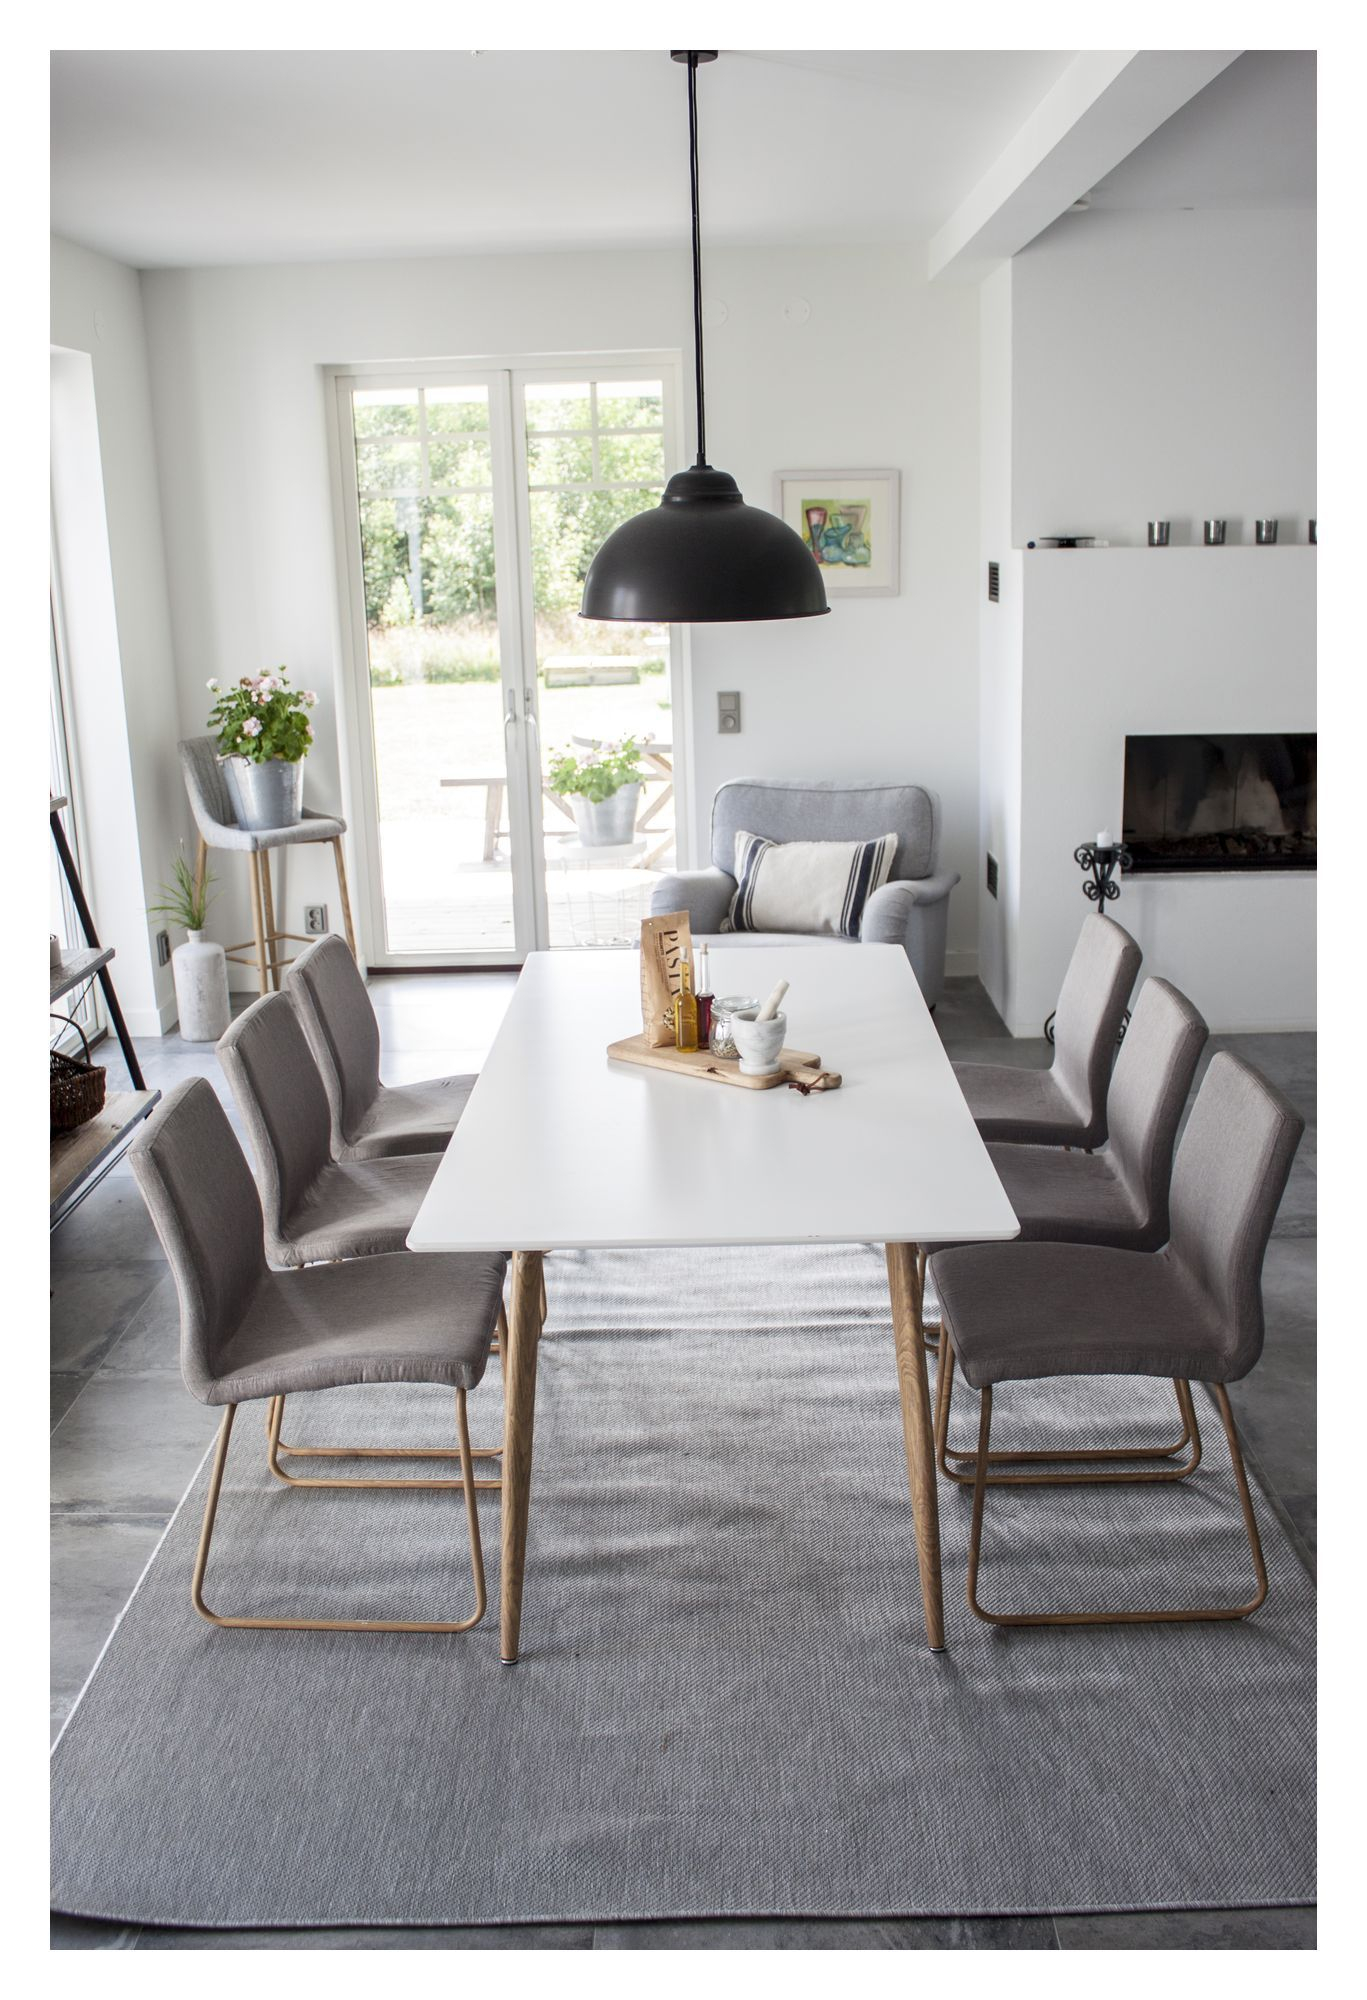 Mace Spisebordsstol, Grå m. ege-look